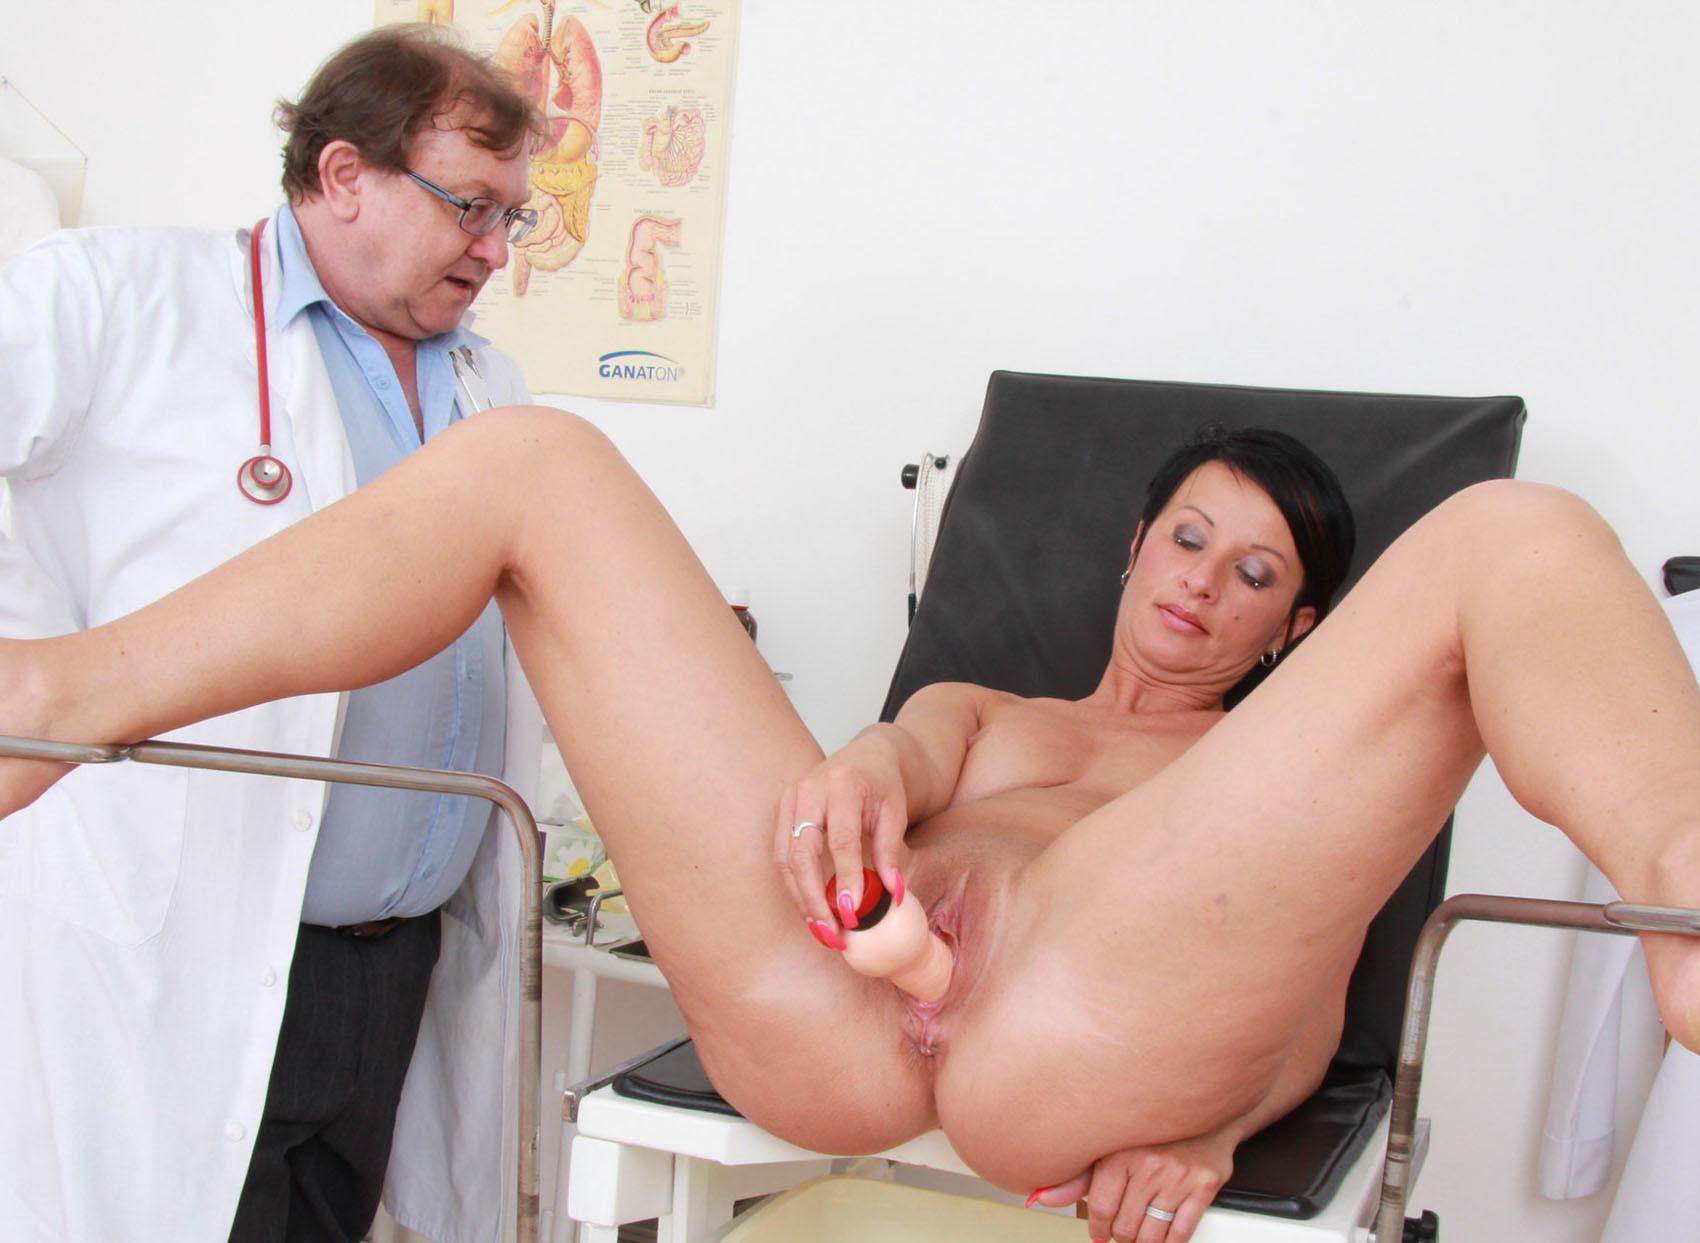 u-ginekologa-russkoe-porno-video-smotret